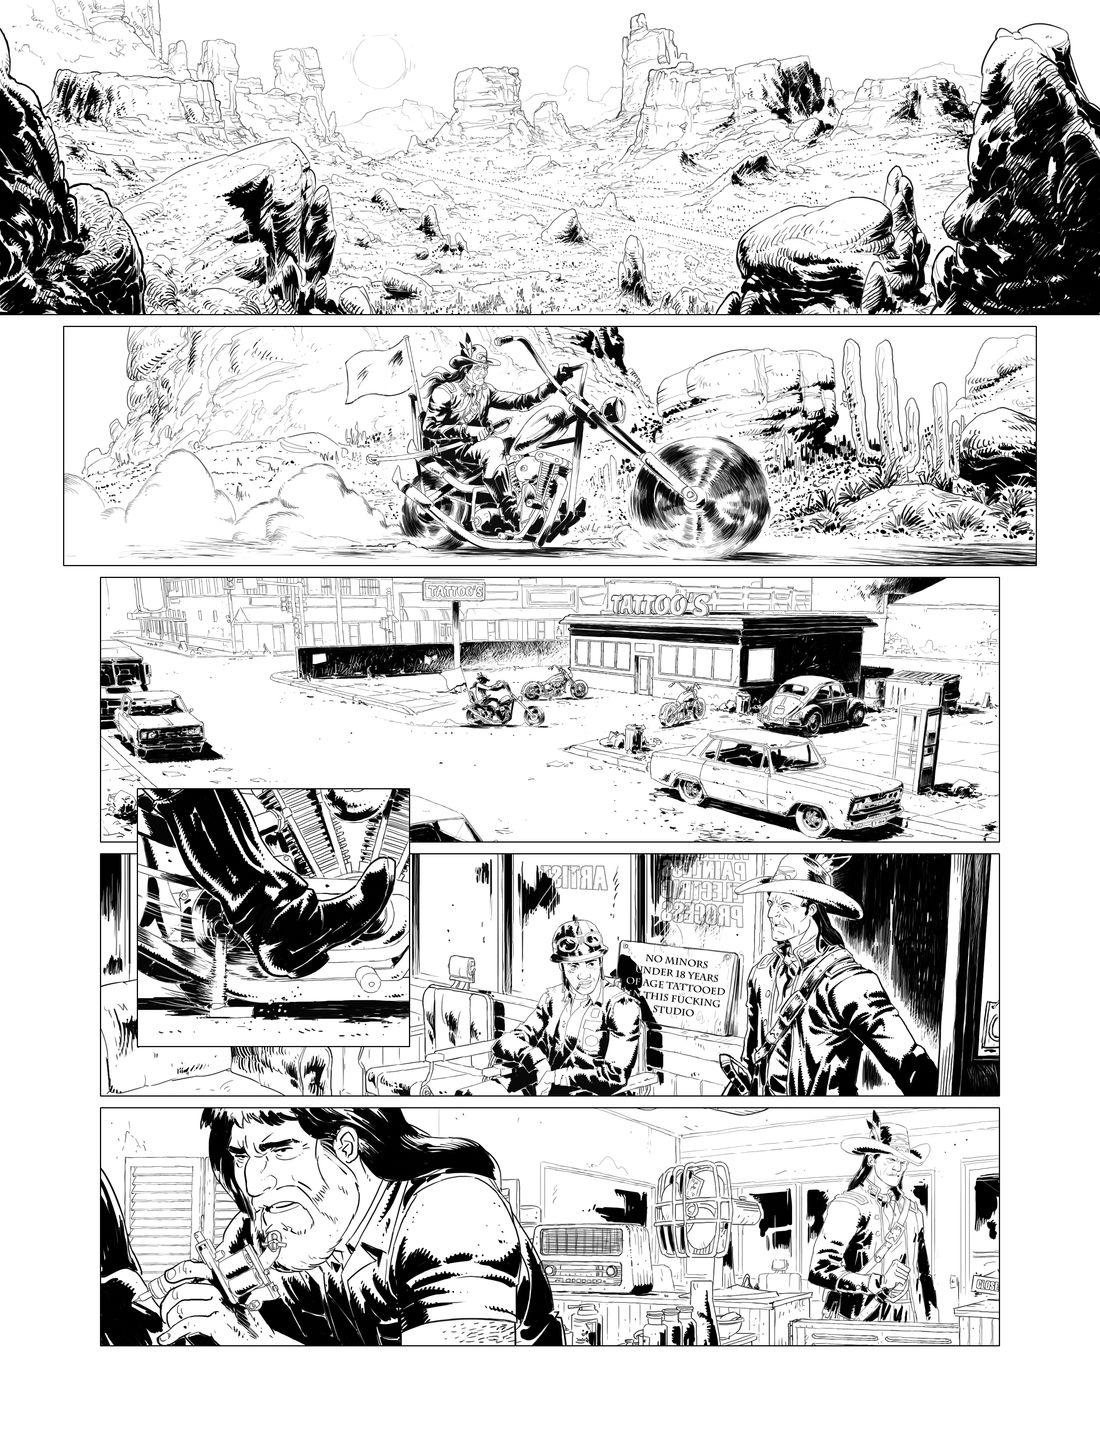 Hit the road, page 1 : noir & blanc © Glénat / Afif Khaled / Dobbs